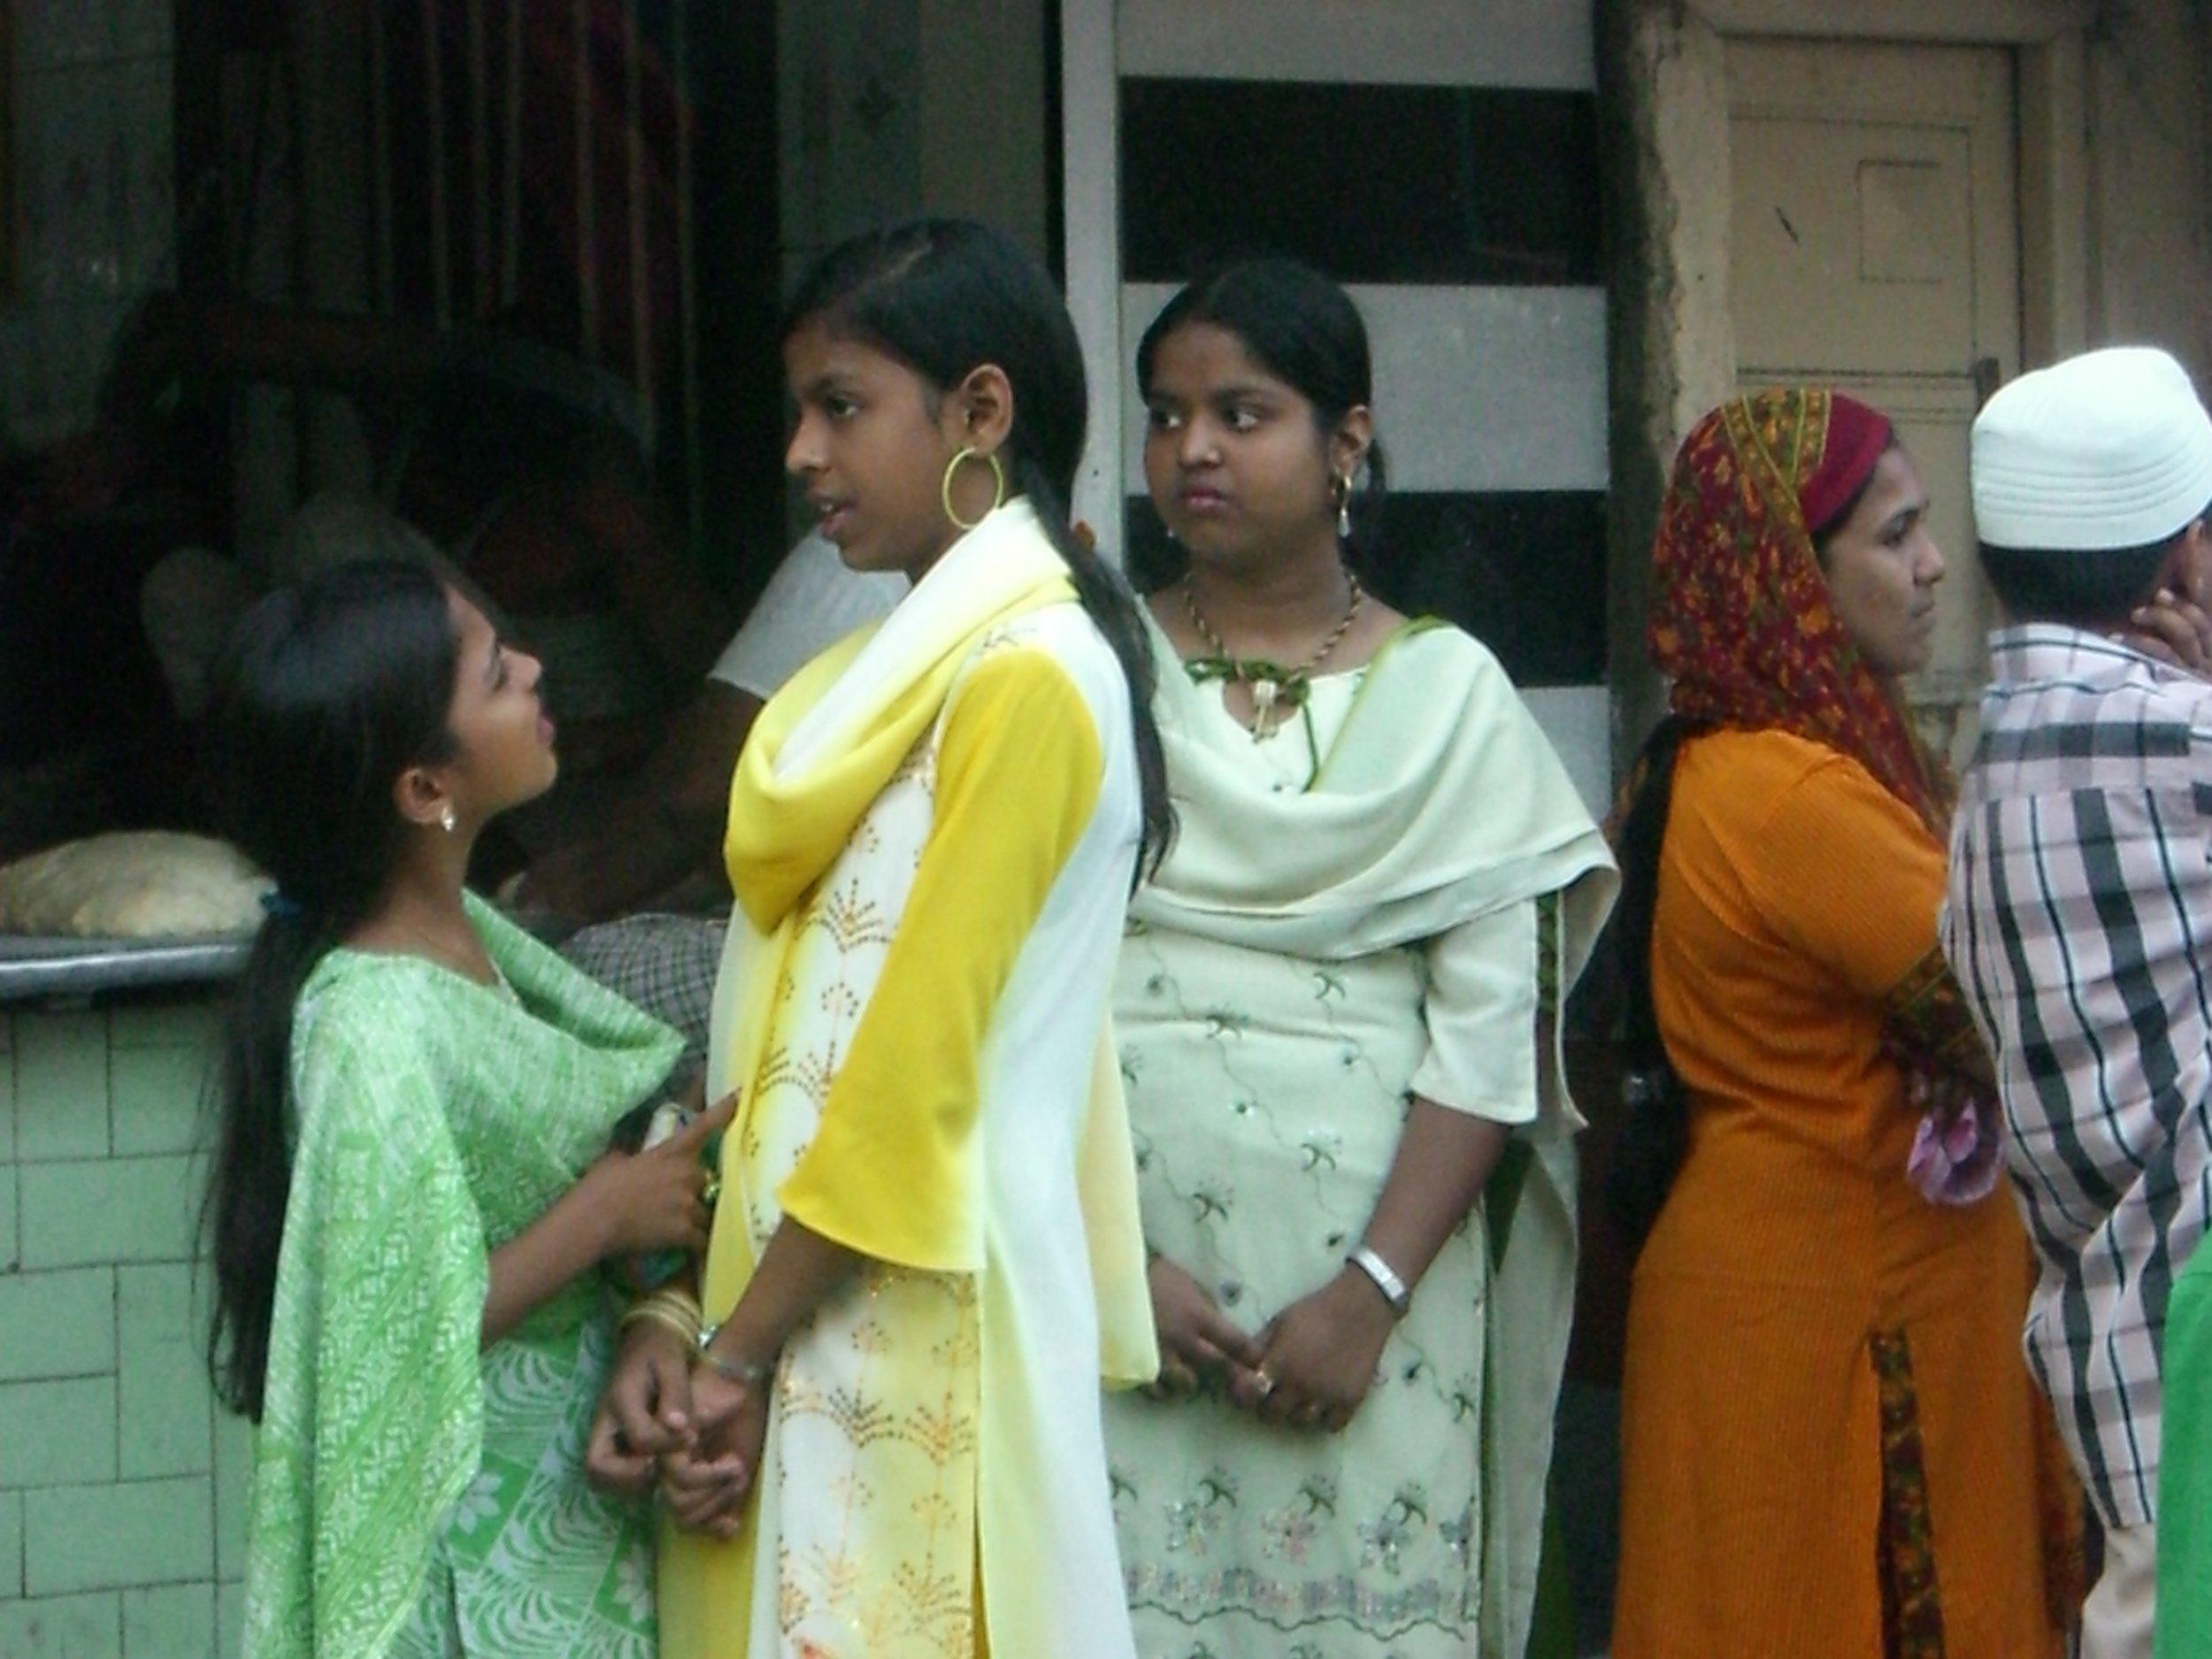 Streets of Mumbai5.JPG